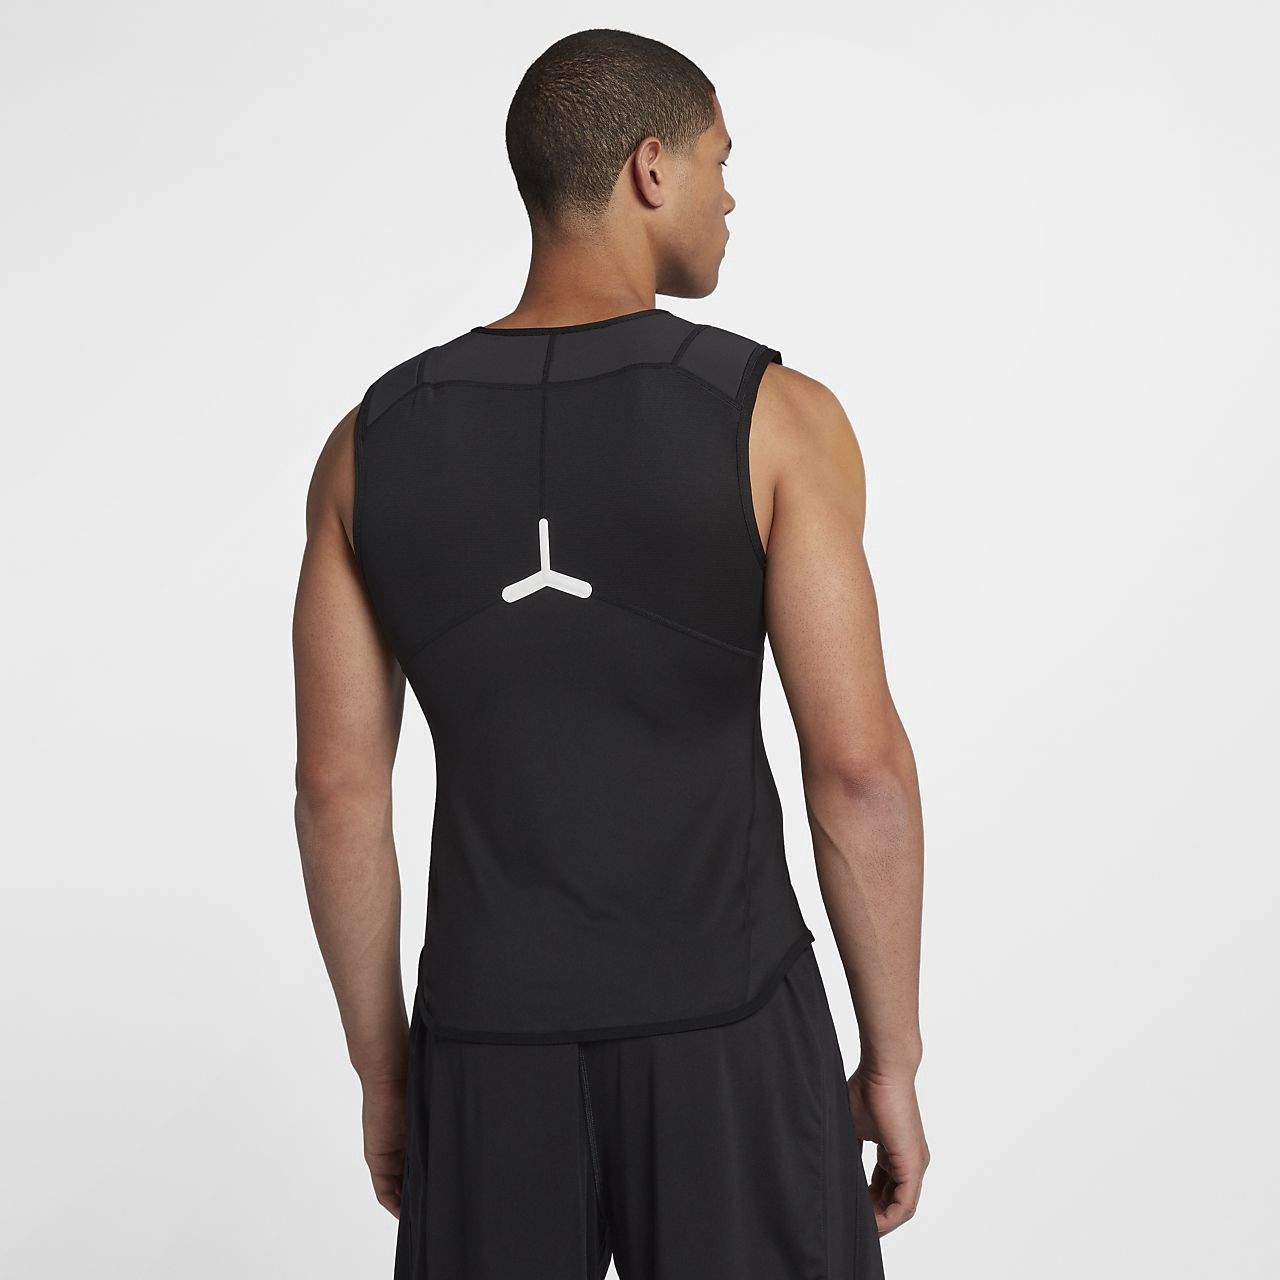 Nike Vapor Speed Men's Sleeveless Football Top 2XL